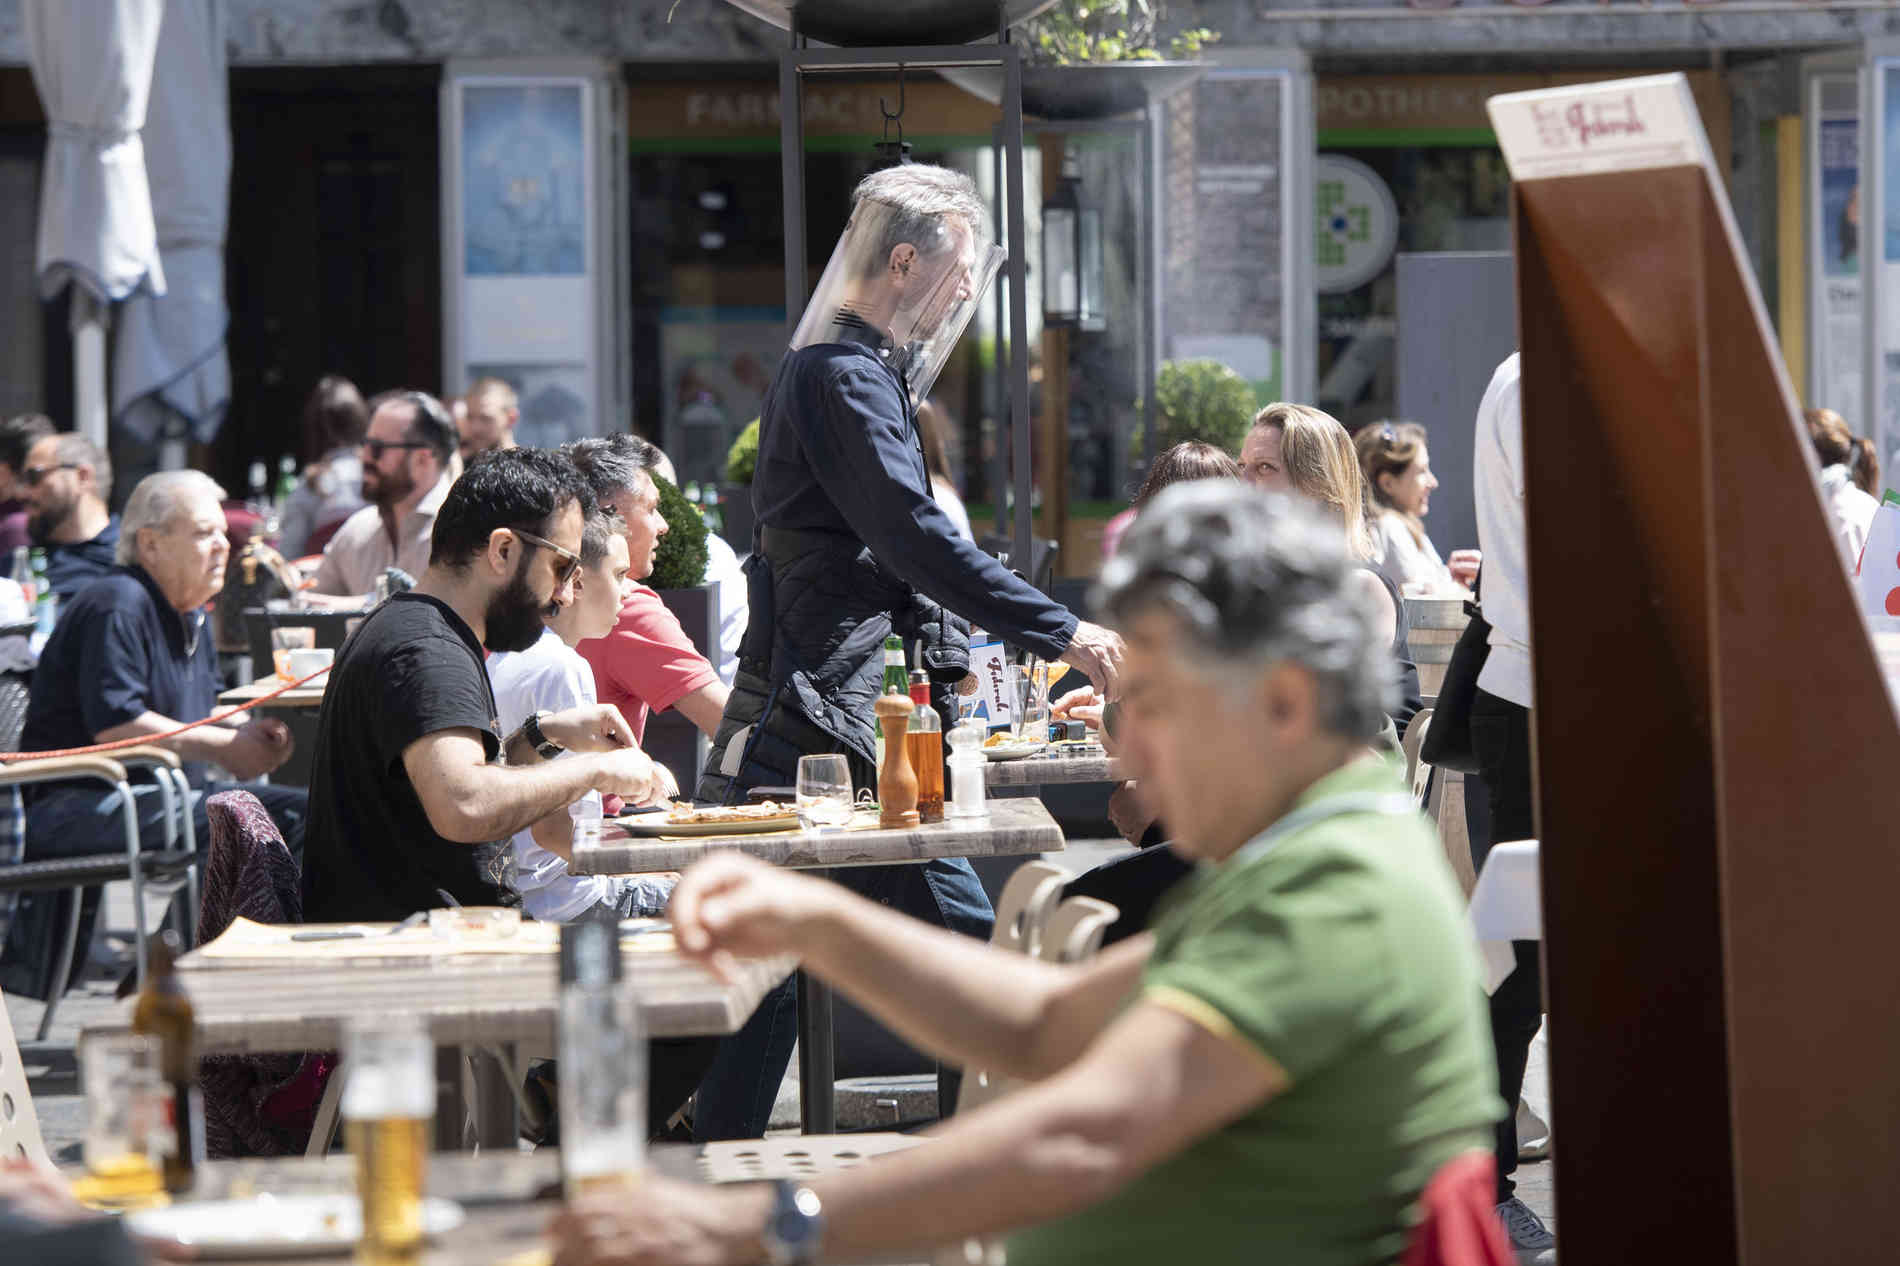 Corona 10 Personen Erlaubt Bayern